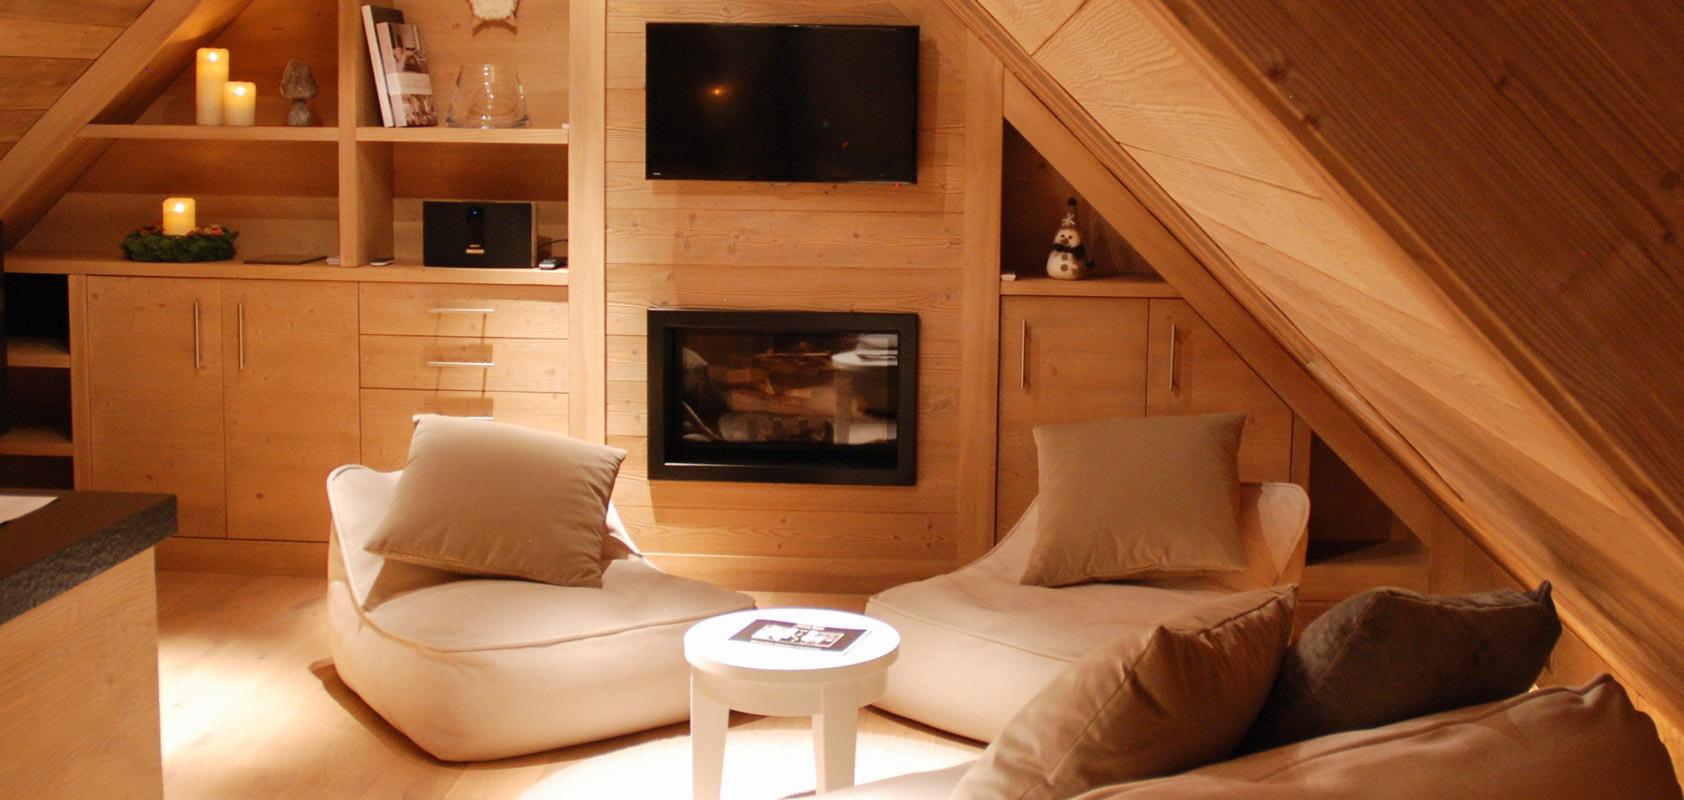 Grand Chalet Colmar Alsace Adresses Exclusives